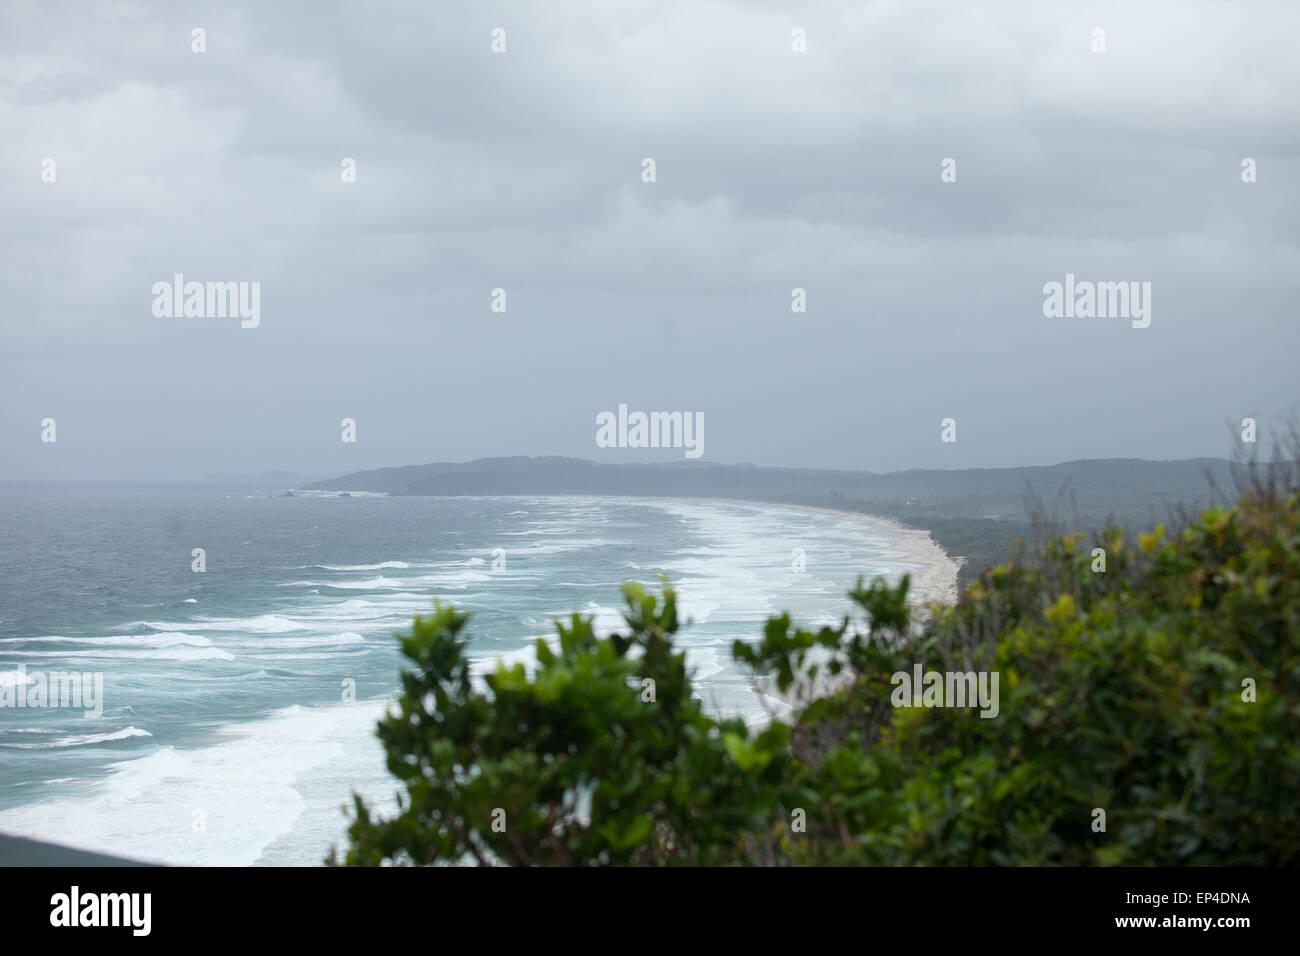 A wideshot of a beach in Byron Bay, Australia. - Stock Image